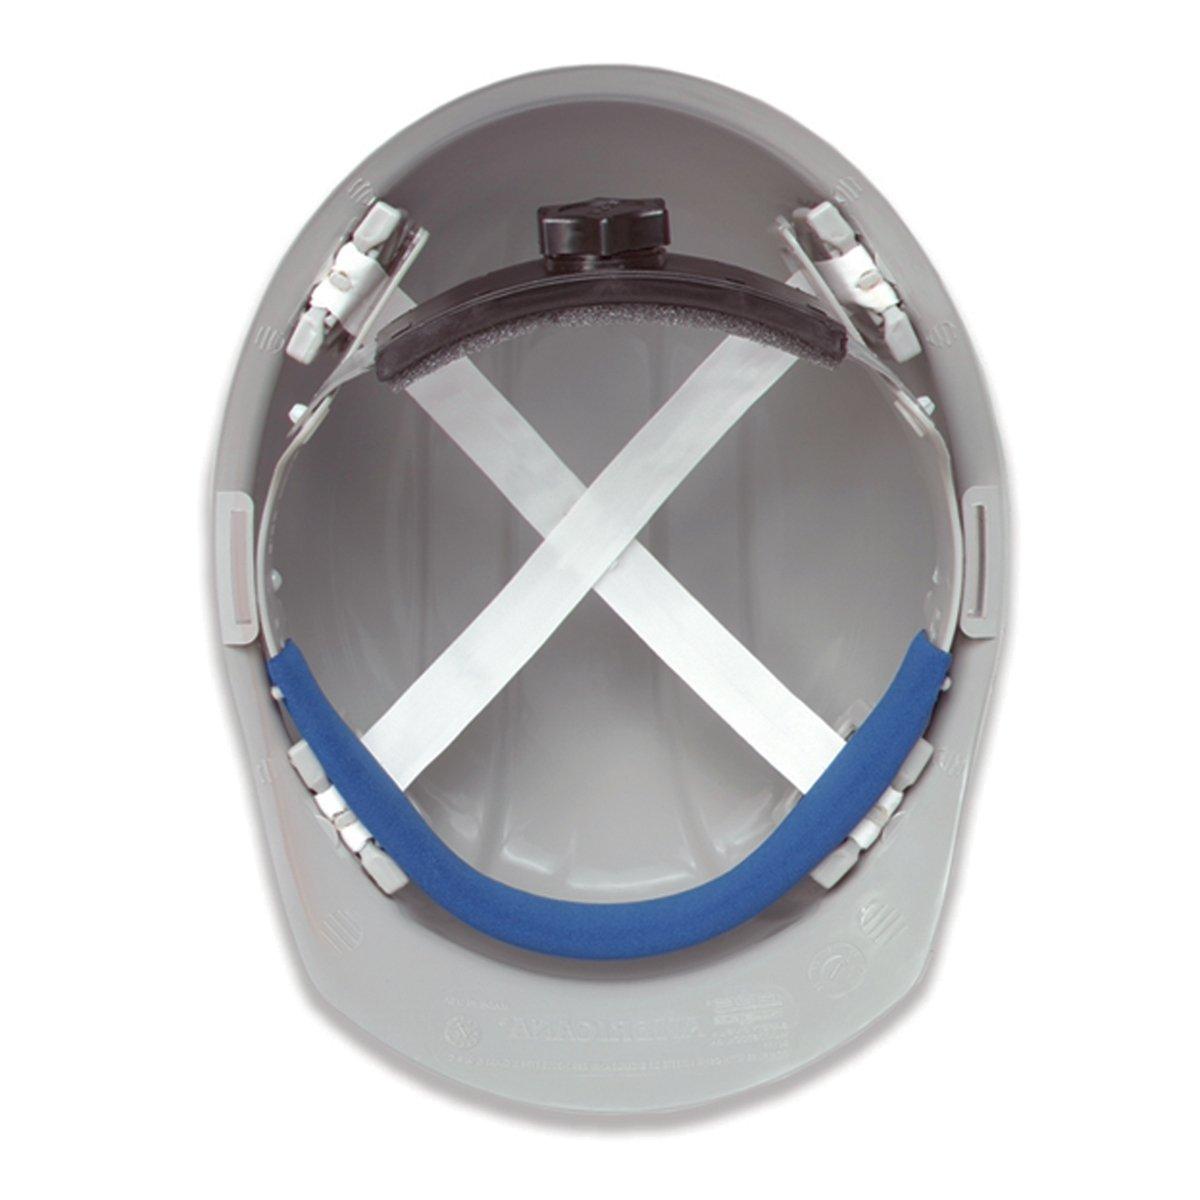 Blue Adjustable ERB Safety 039-19380 I-575R Replacement Ratchet Suspension Plastic//Nylon